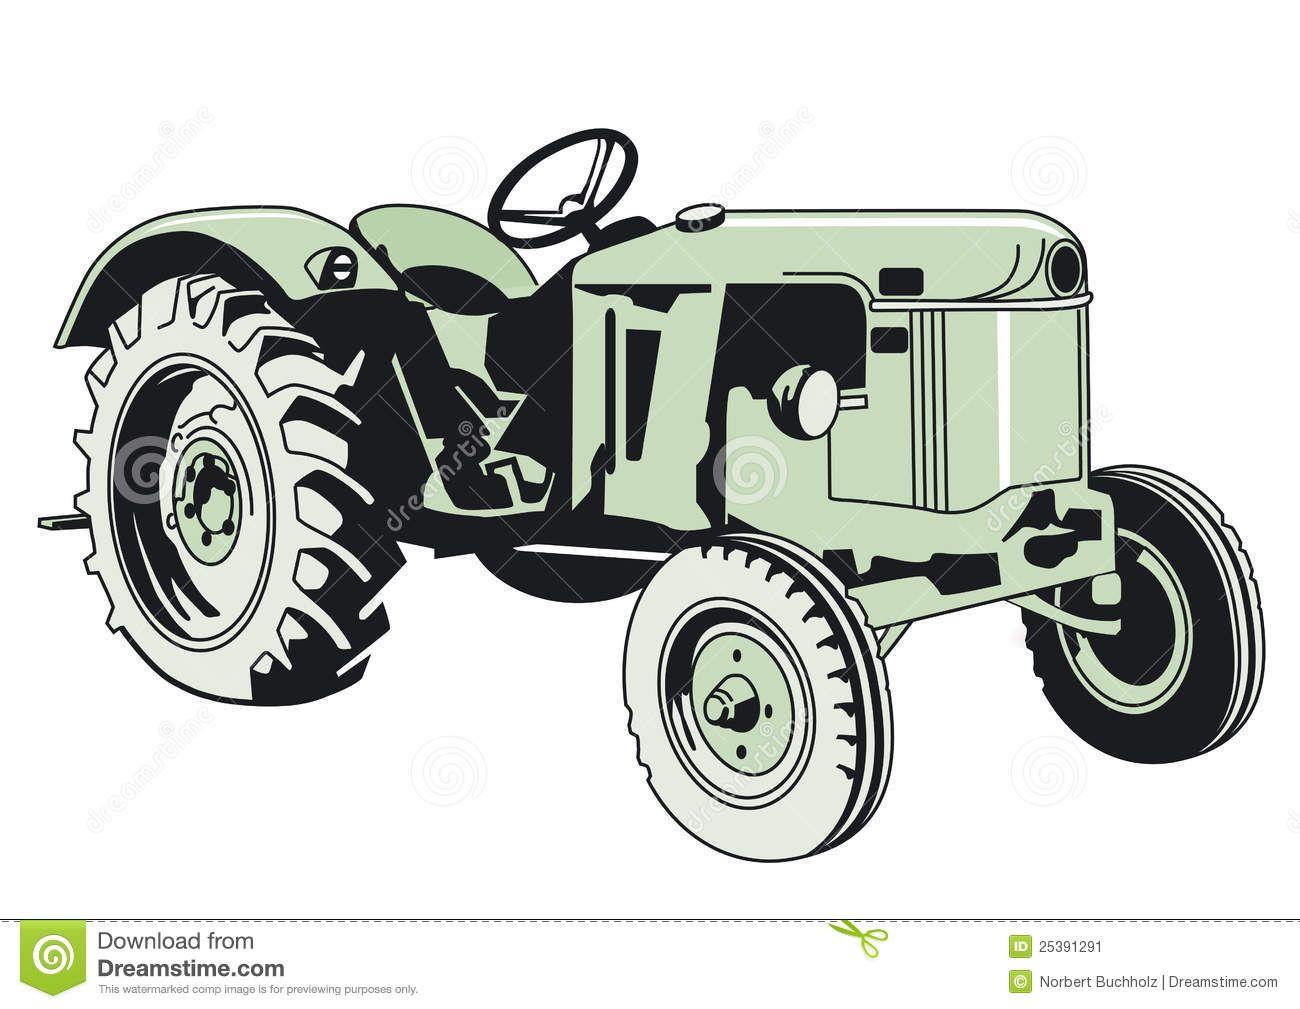 Ausmalbilder Traktor Deutz : Image From Http Thumbs Dreamstime Com Z Drawing Green Tractor